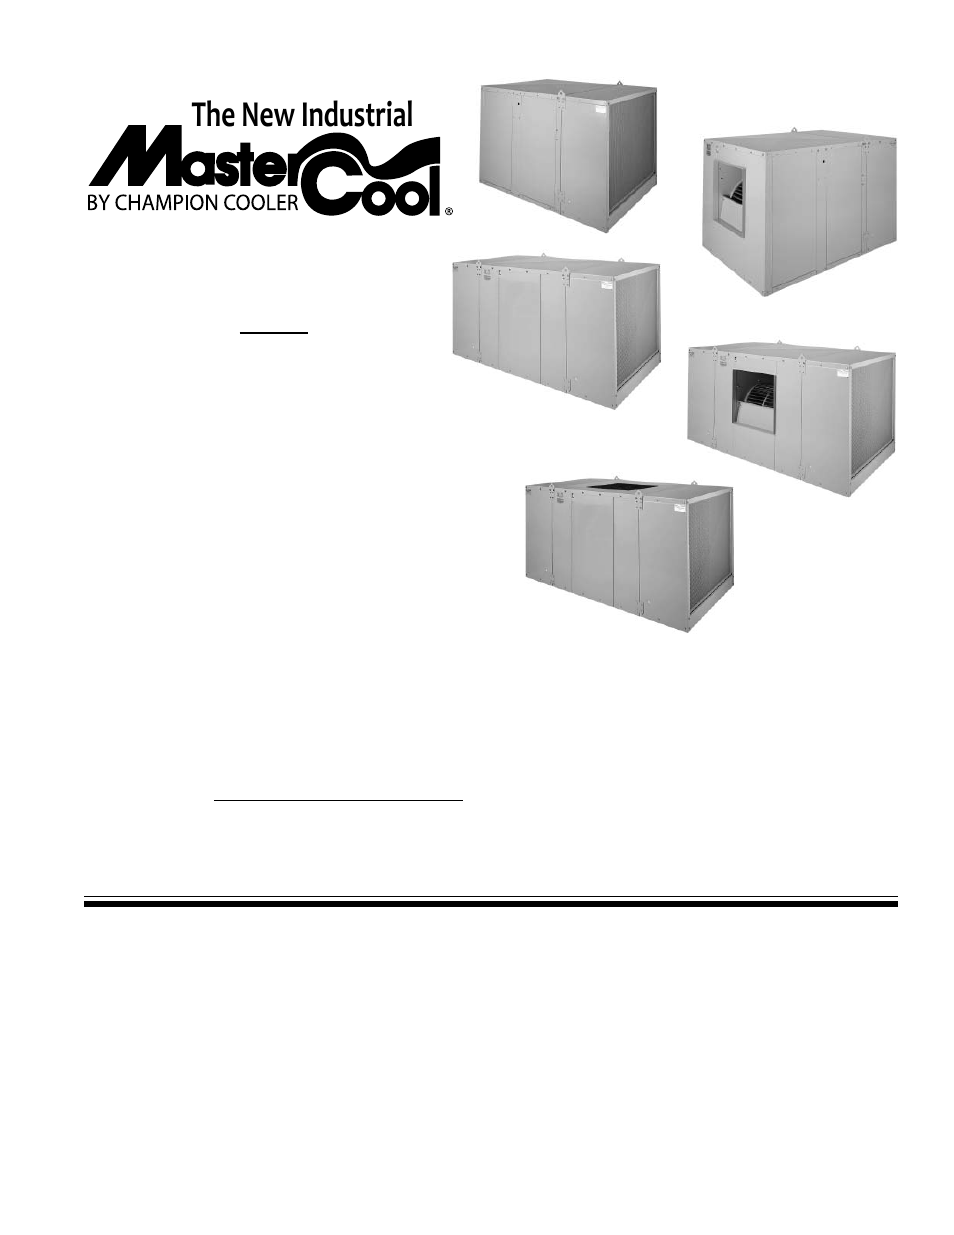 Essick Air SAD10012 User Manual   16 pages   Also for: AS150, AS10012,  SAD100, AD15012, SAD15012, SAS100, AD10012, SAS10012, AD20012